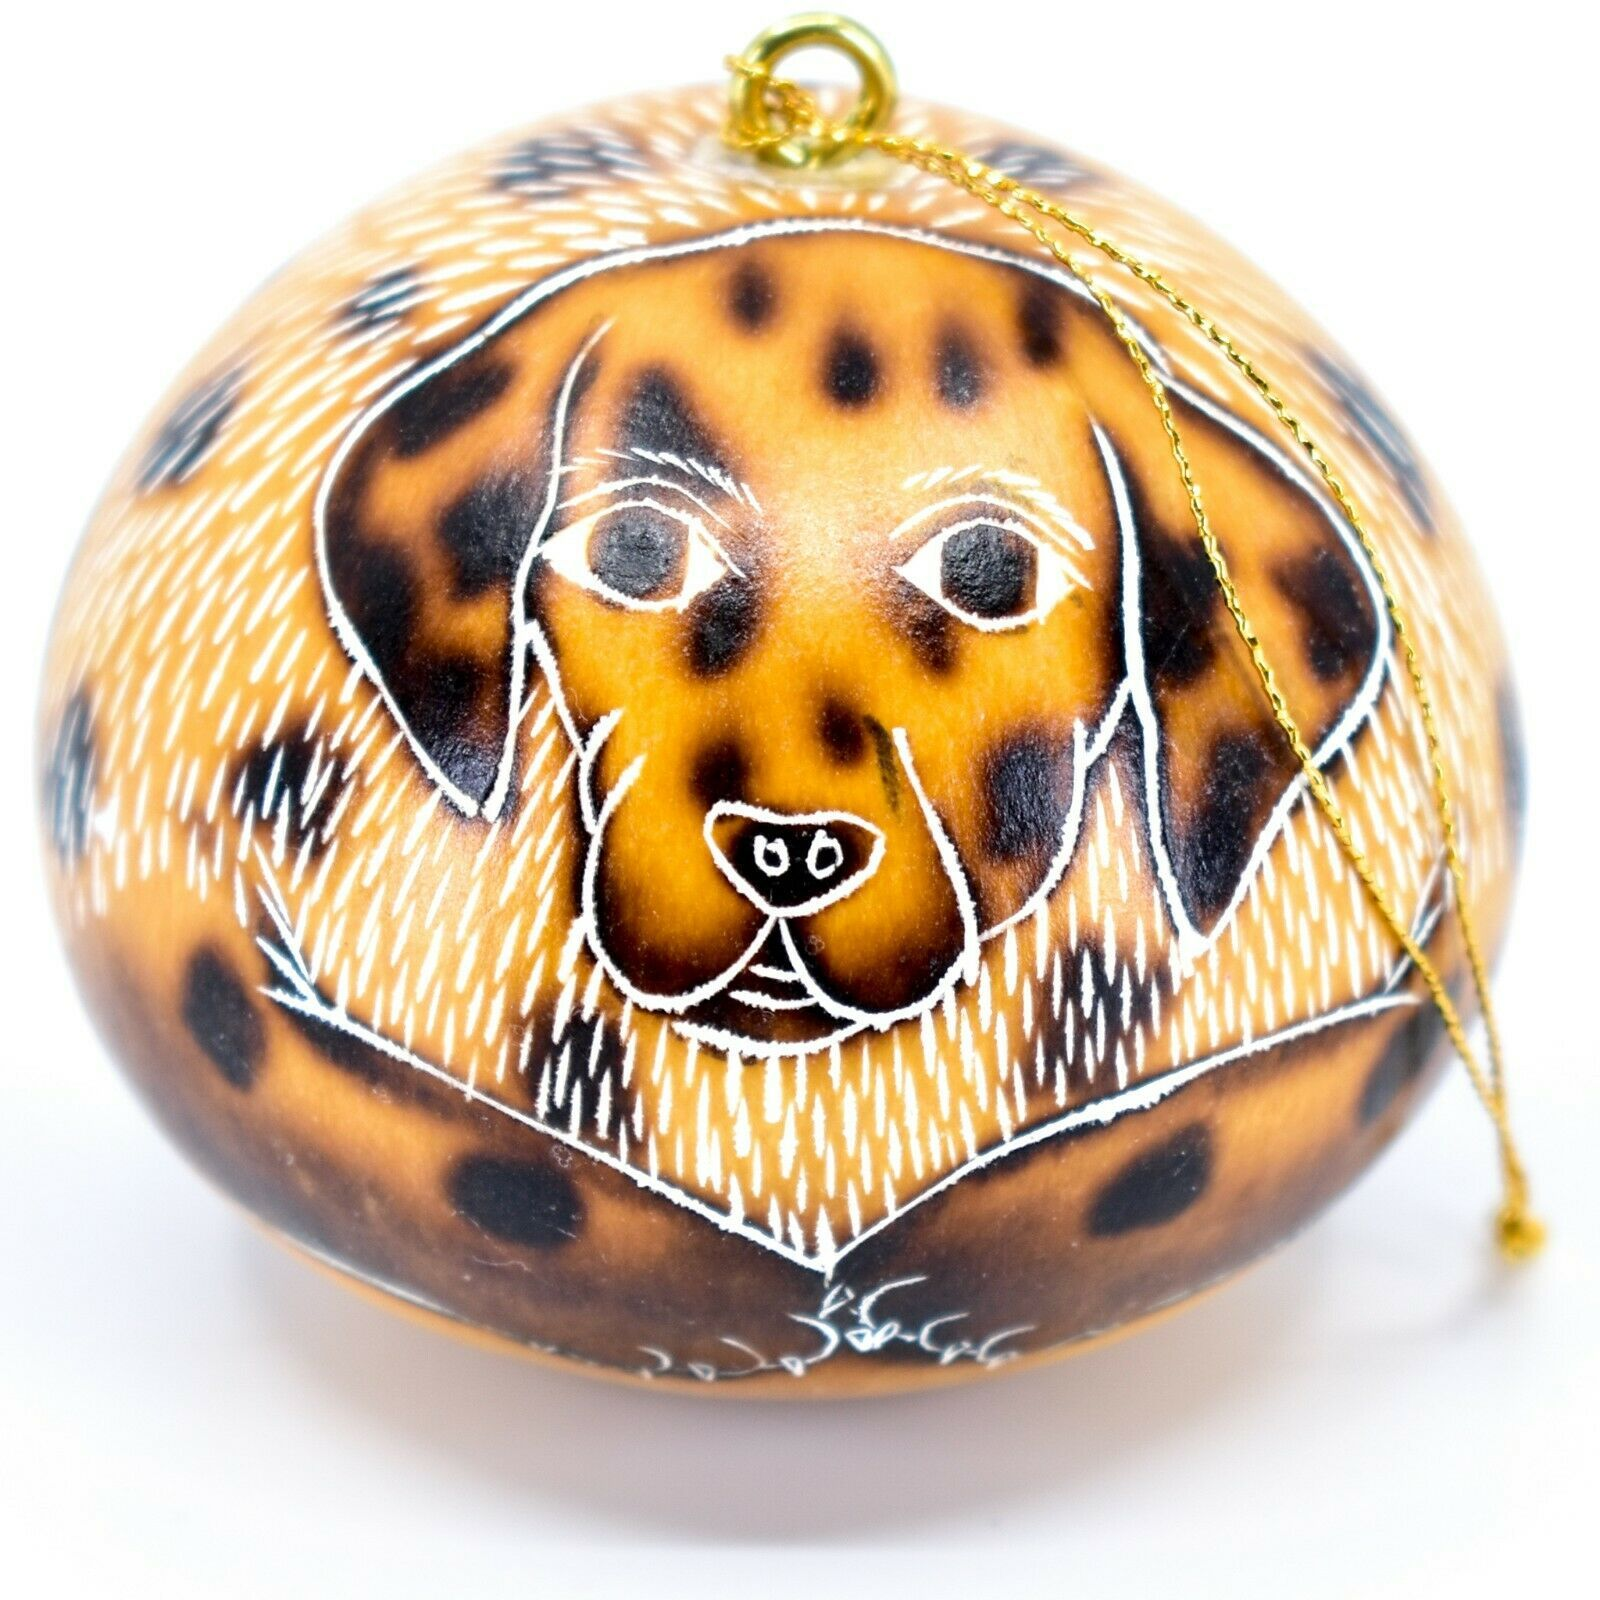 Handcrafted Carved Gourd Art Dalmatian Puppy Dog Ornament Handmade in Peru